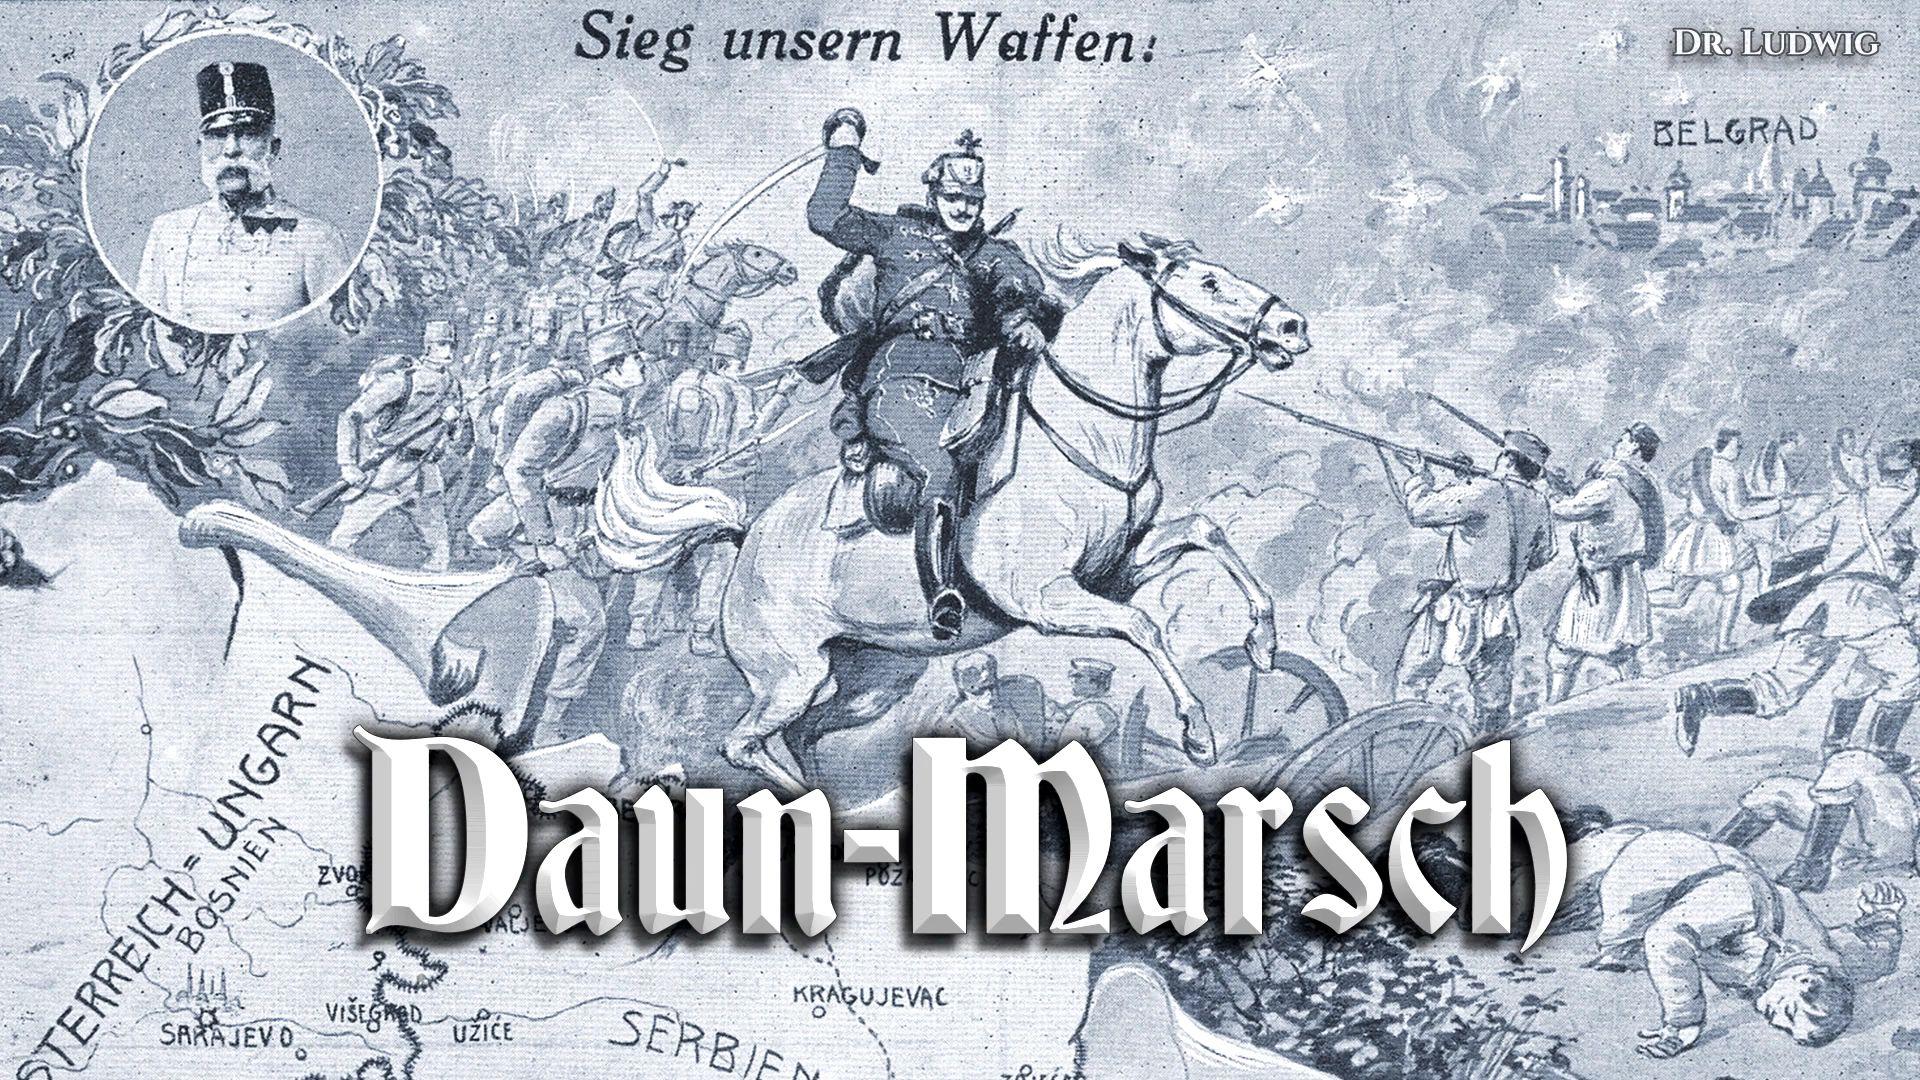 Daun-Marsch[道恩-进行曲][奥地利进行曲]